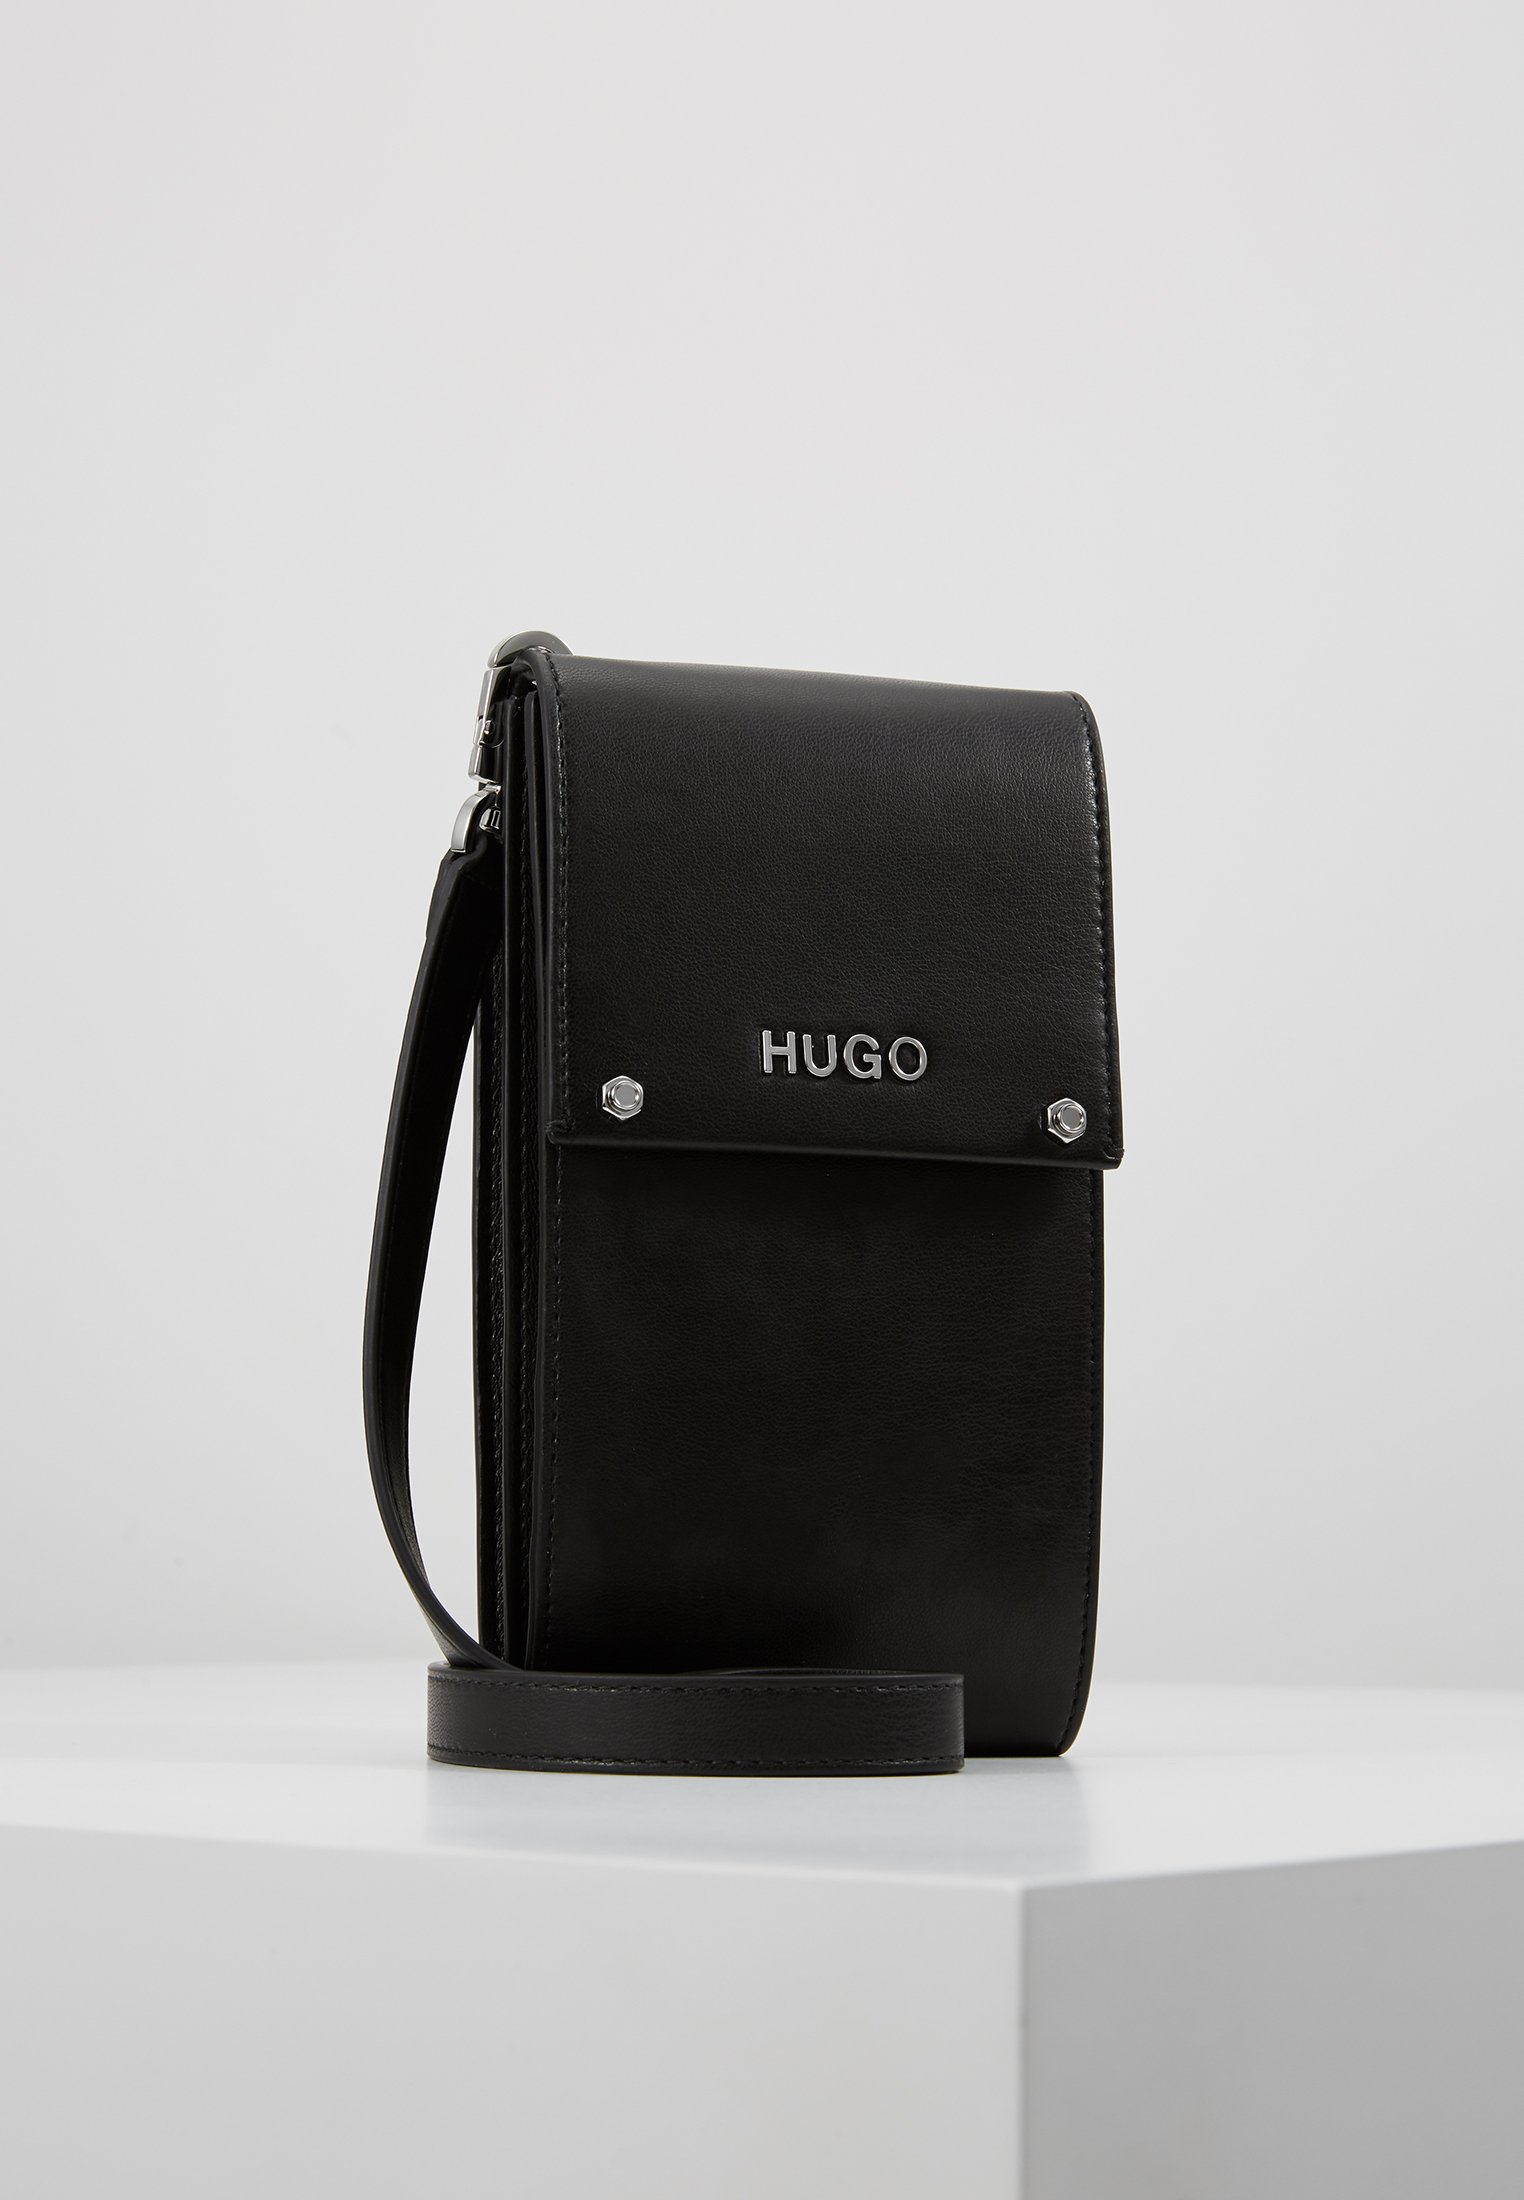 Hugo Bandoulière Phone Leyton CaseSac Black 6gbf7y